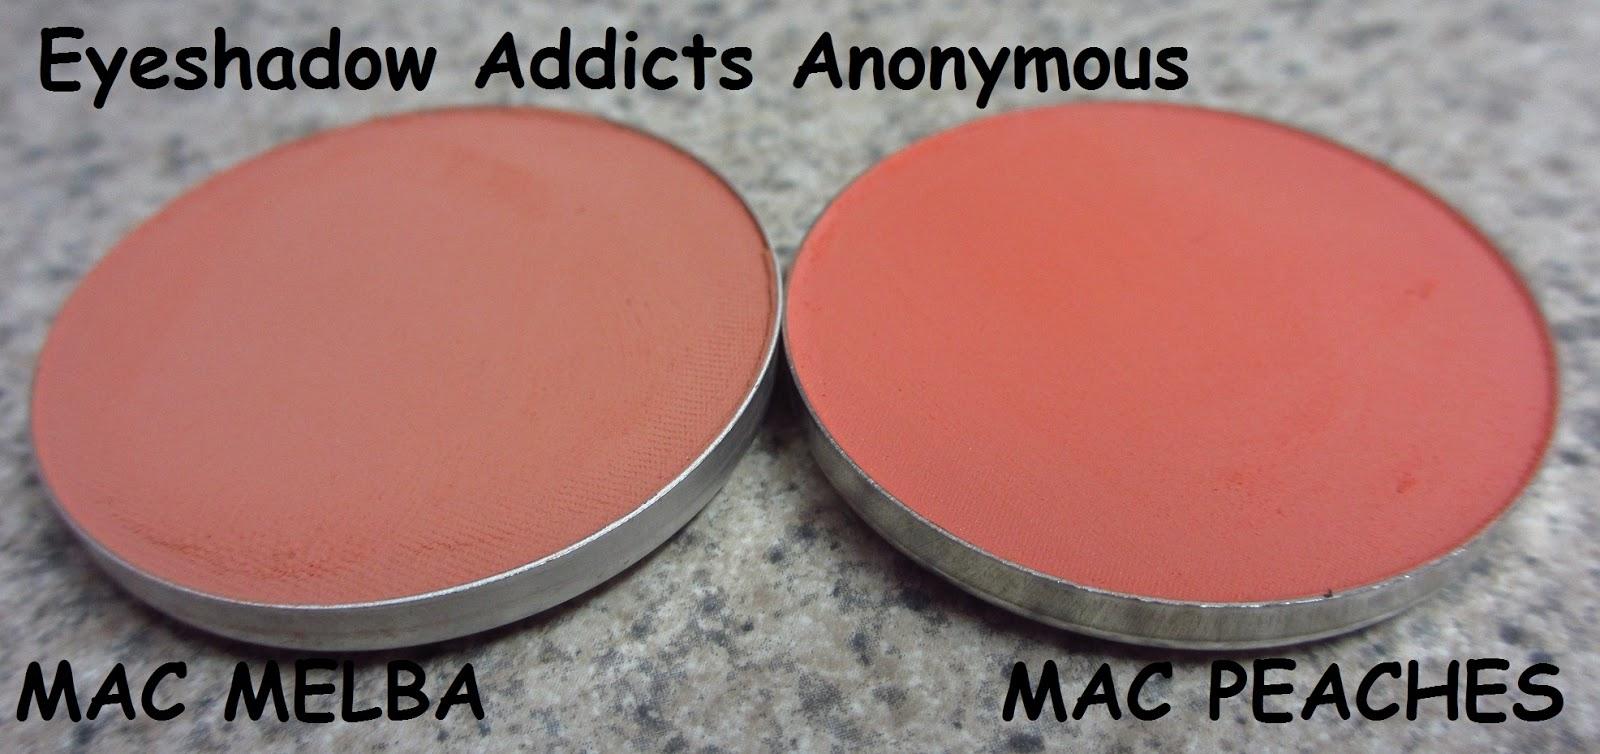 Eyeshadow Addicts Anonymous: February 2013